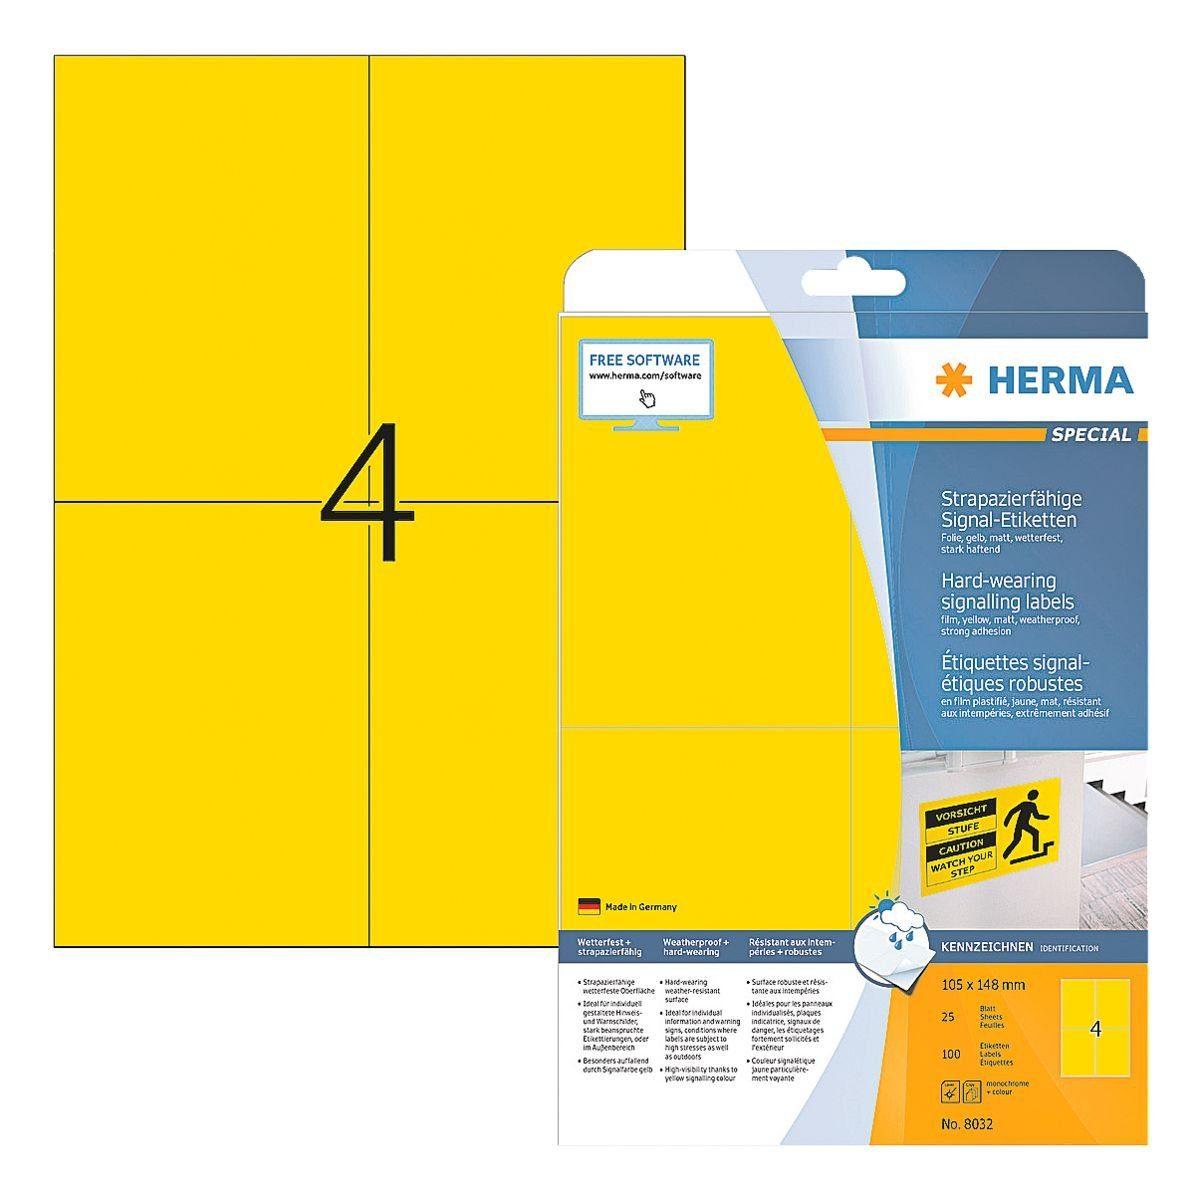 HERMA Outdoor Folien-Etiketten 100 Stück »Special«